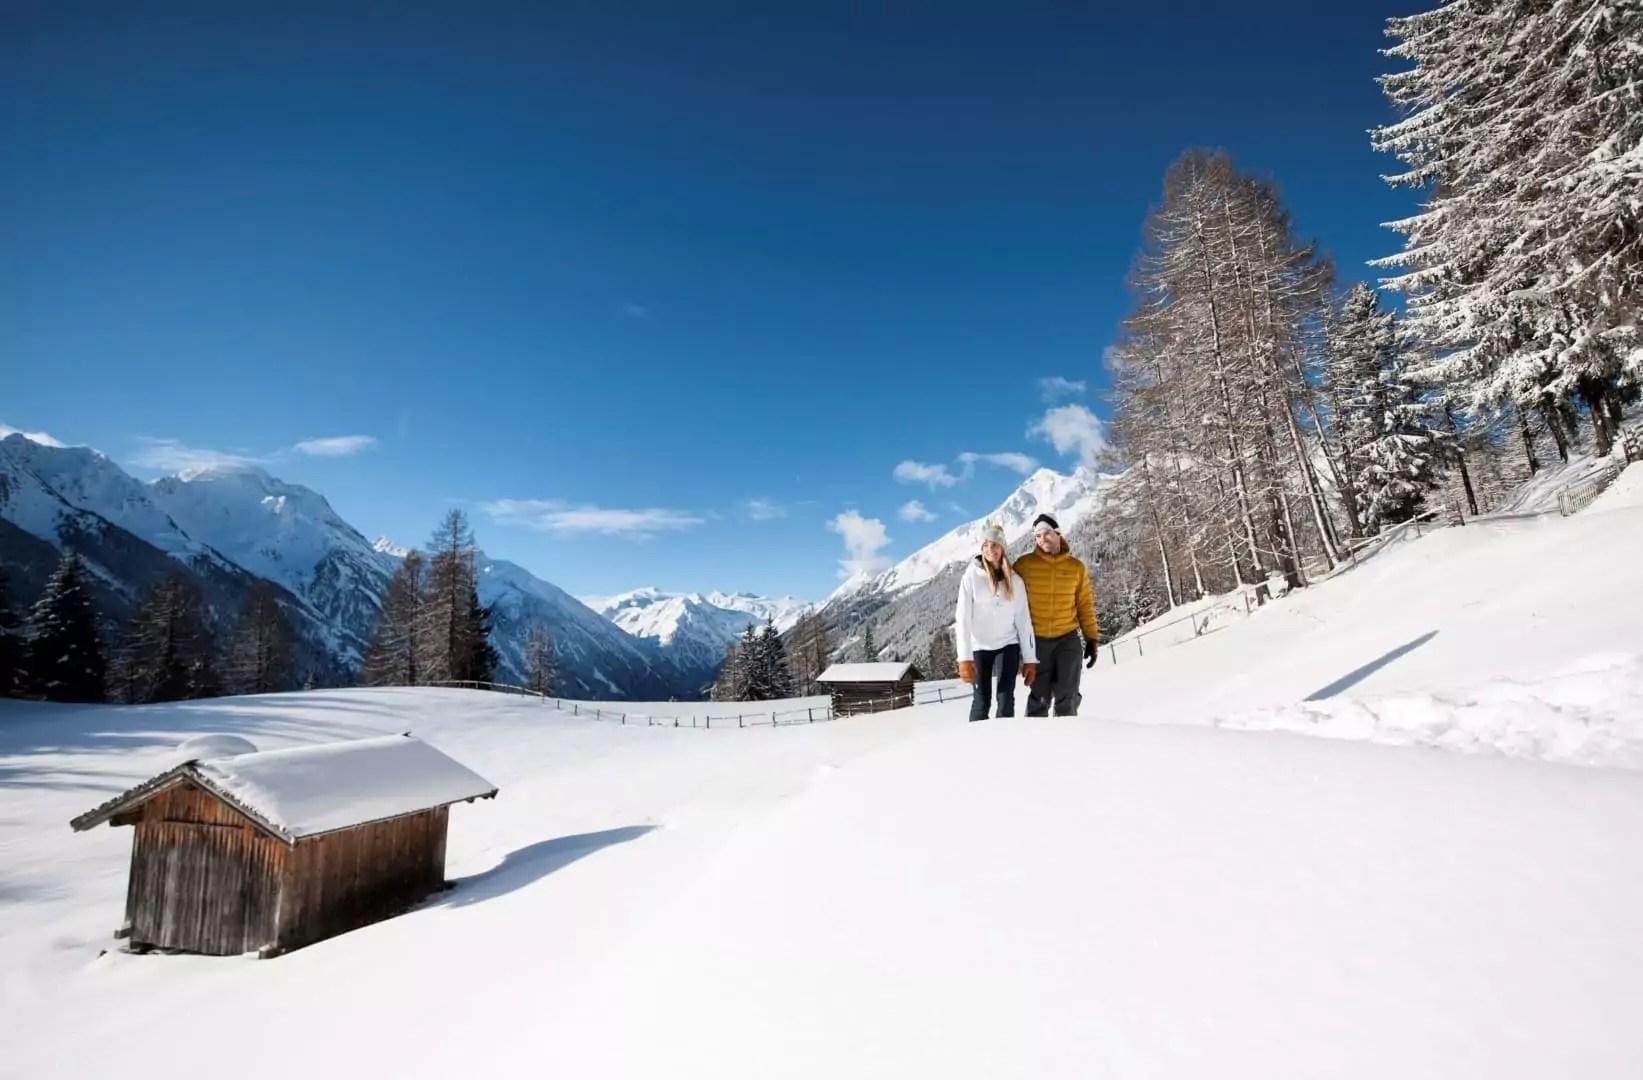 après-ski in Neustift